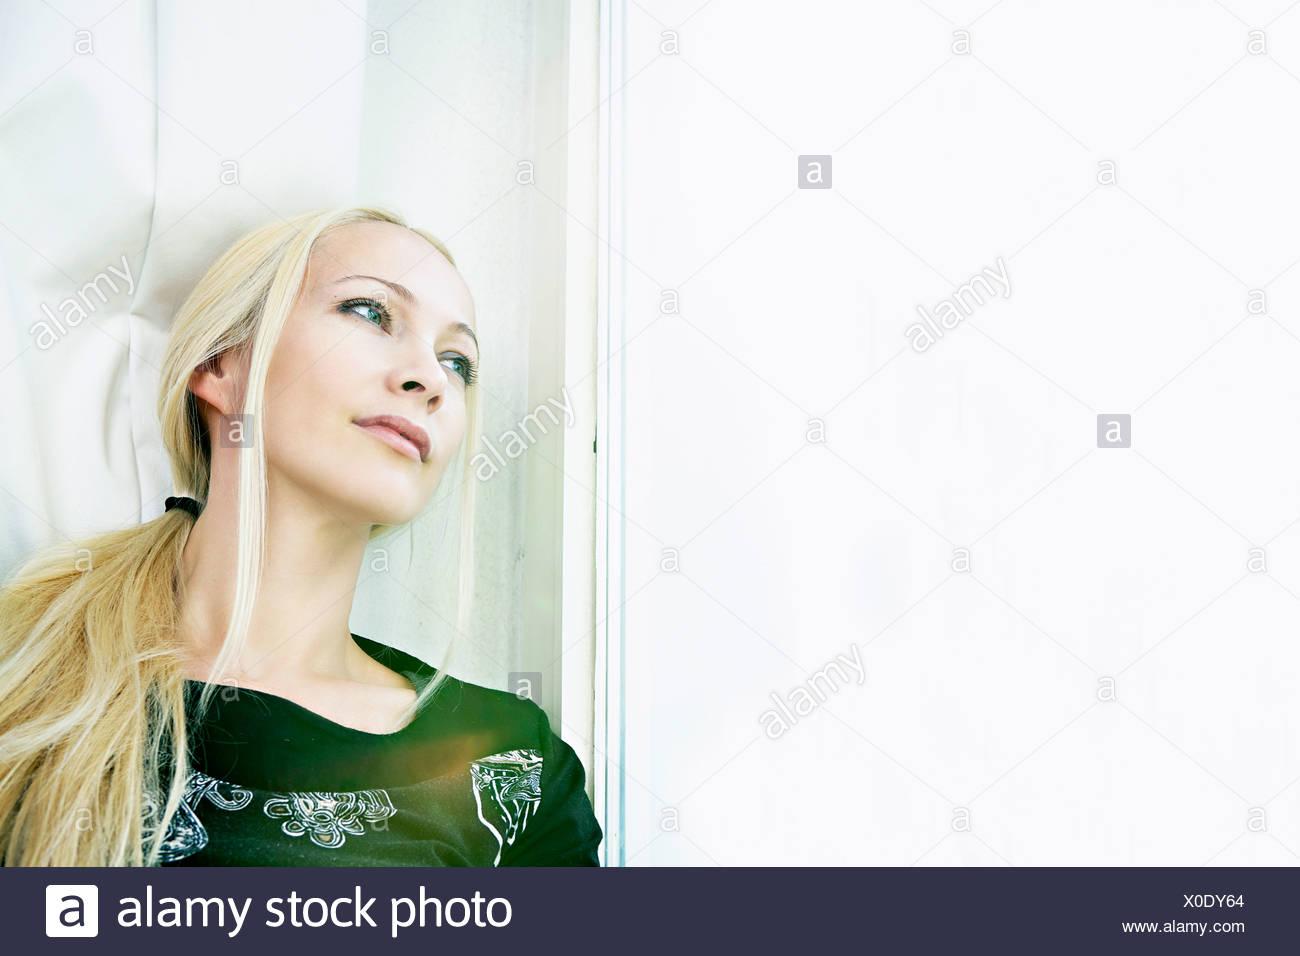 Blond woman day dreaming, Munich, Bavaria, Germany - Stock Image